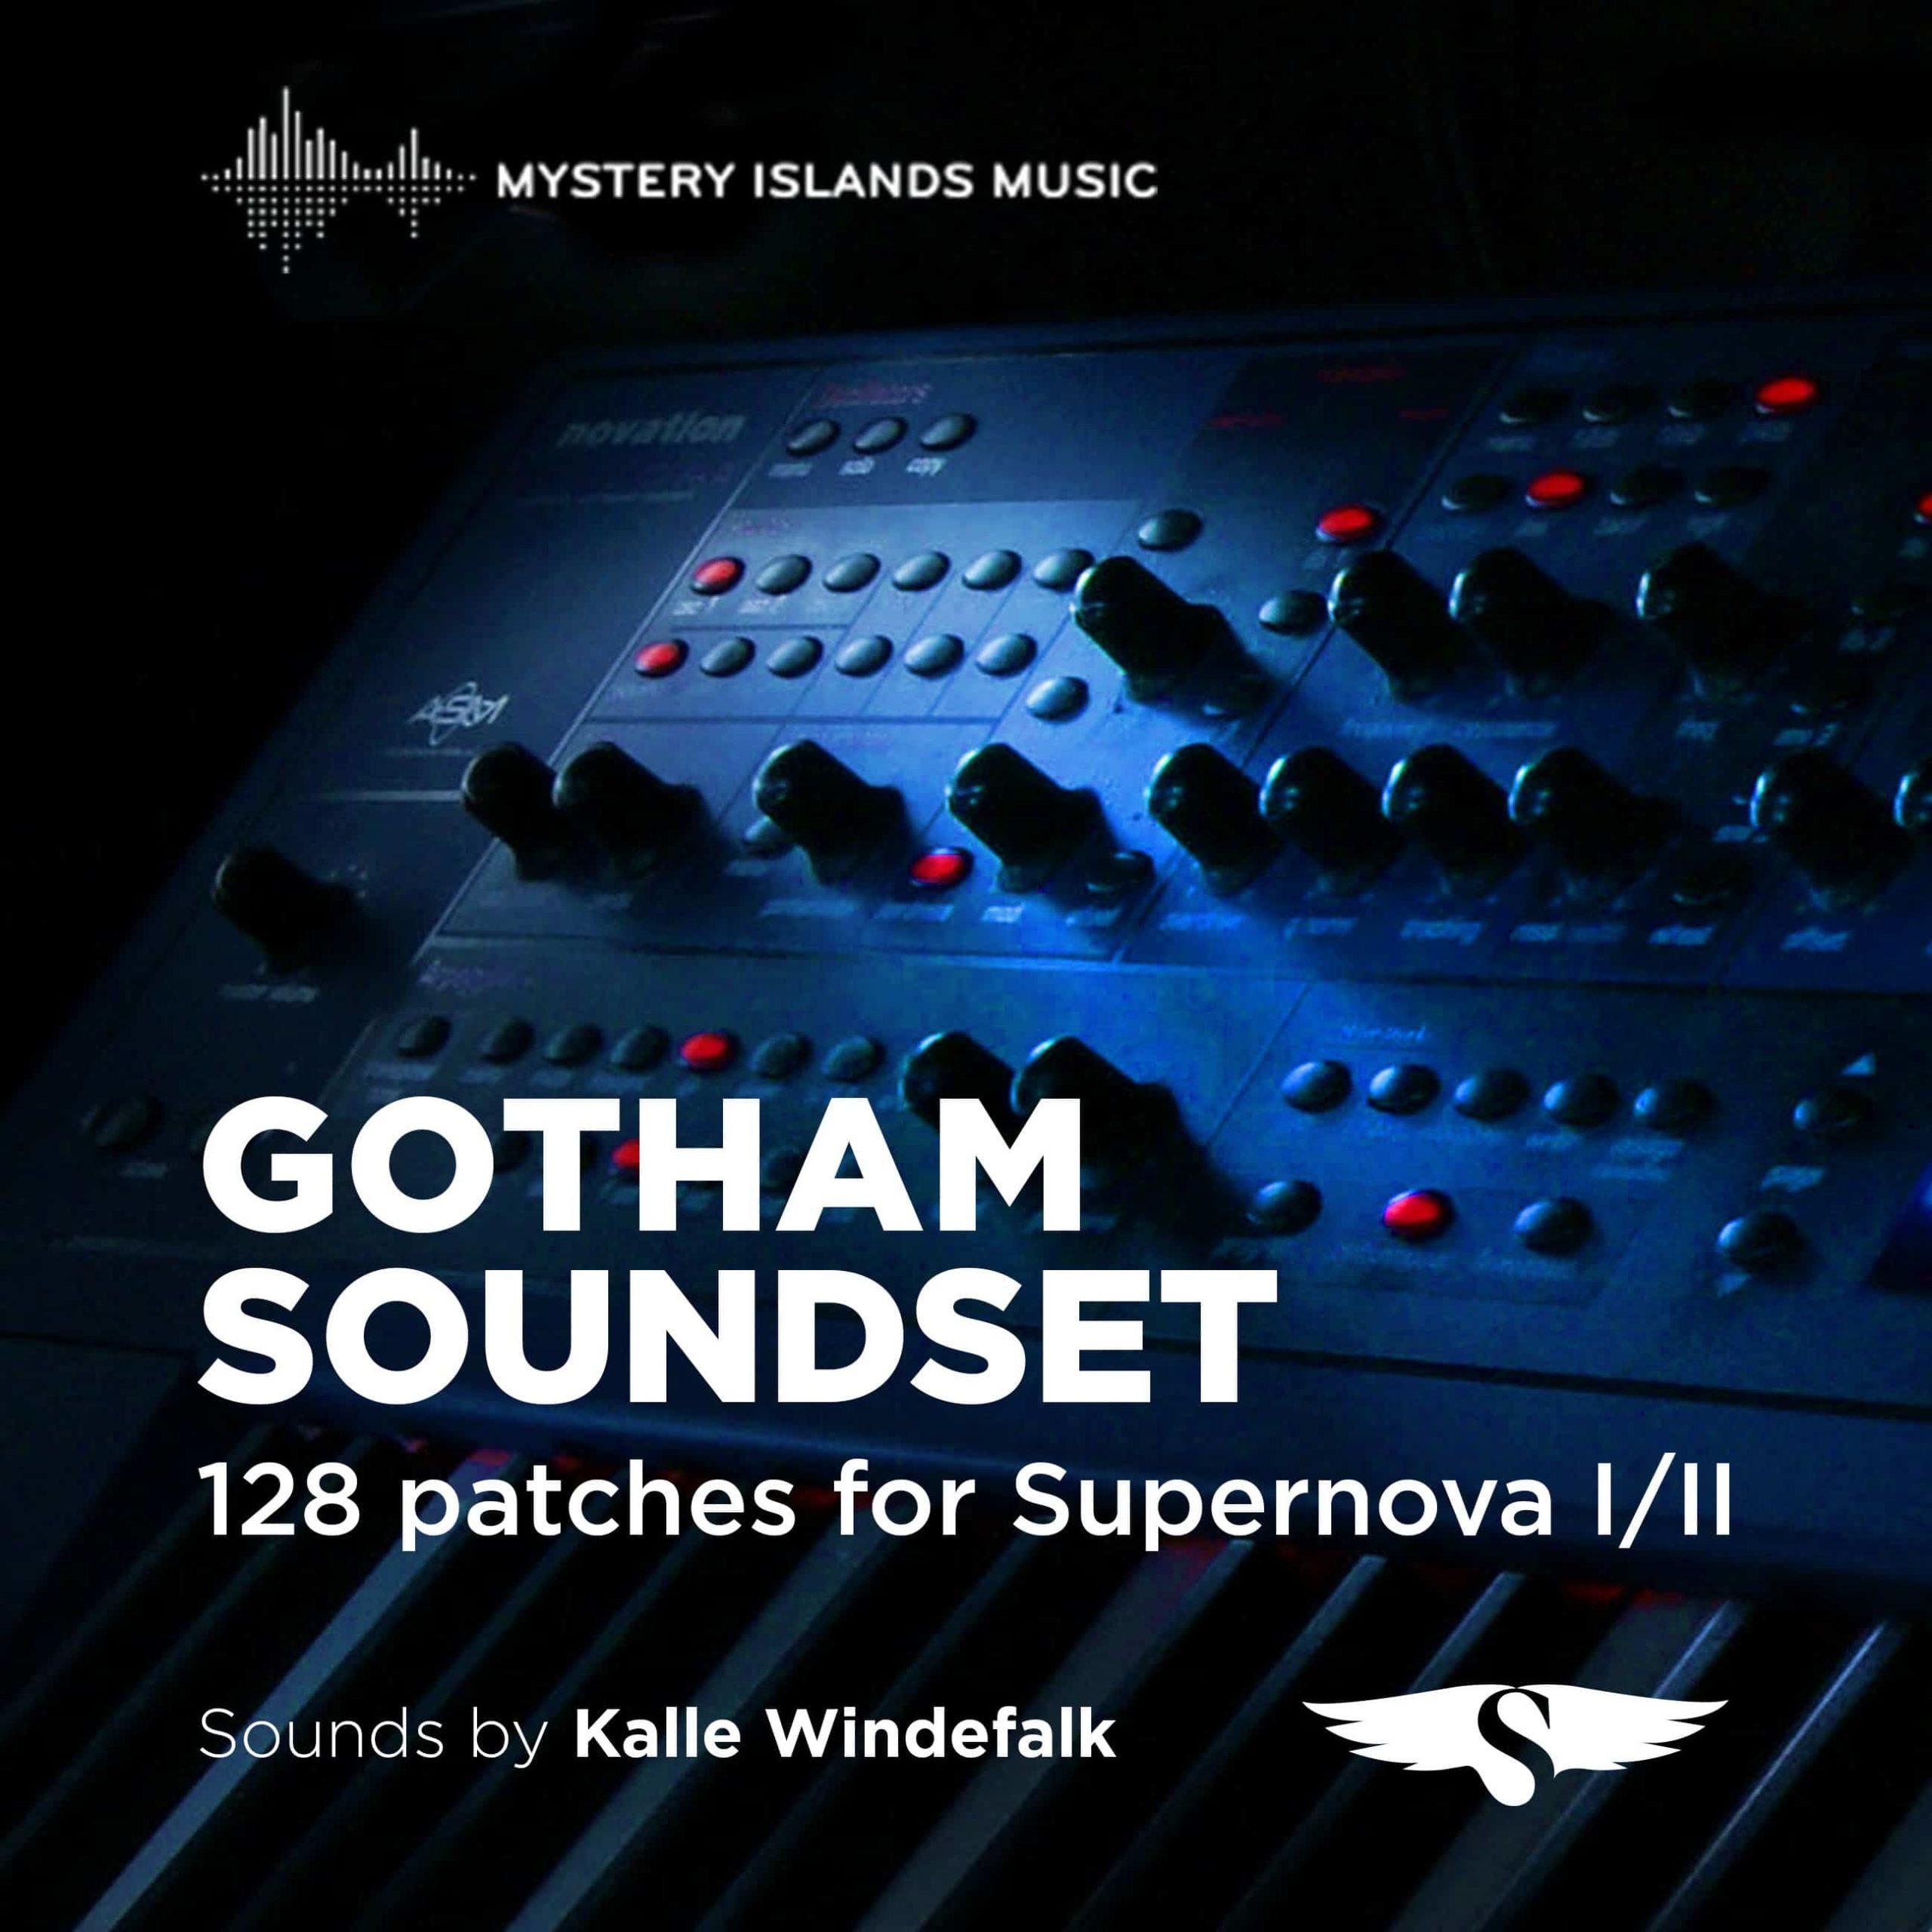 korg ms2000 resurrection soundset by seraphic music